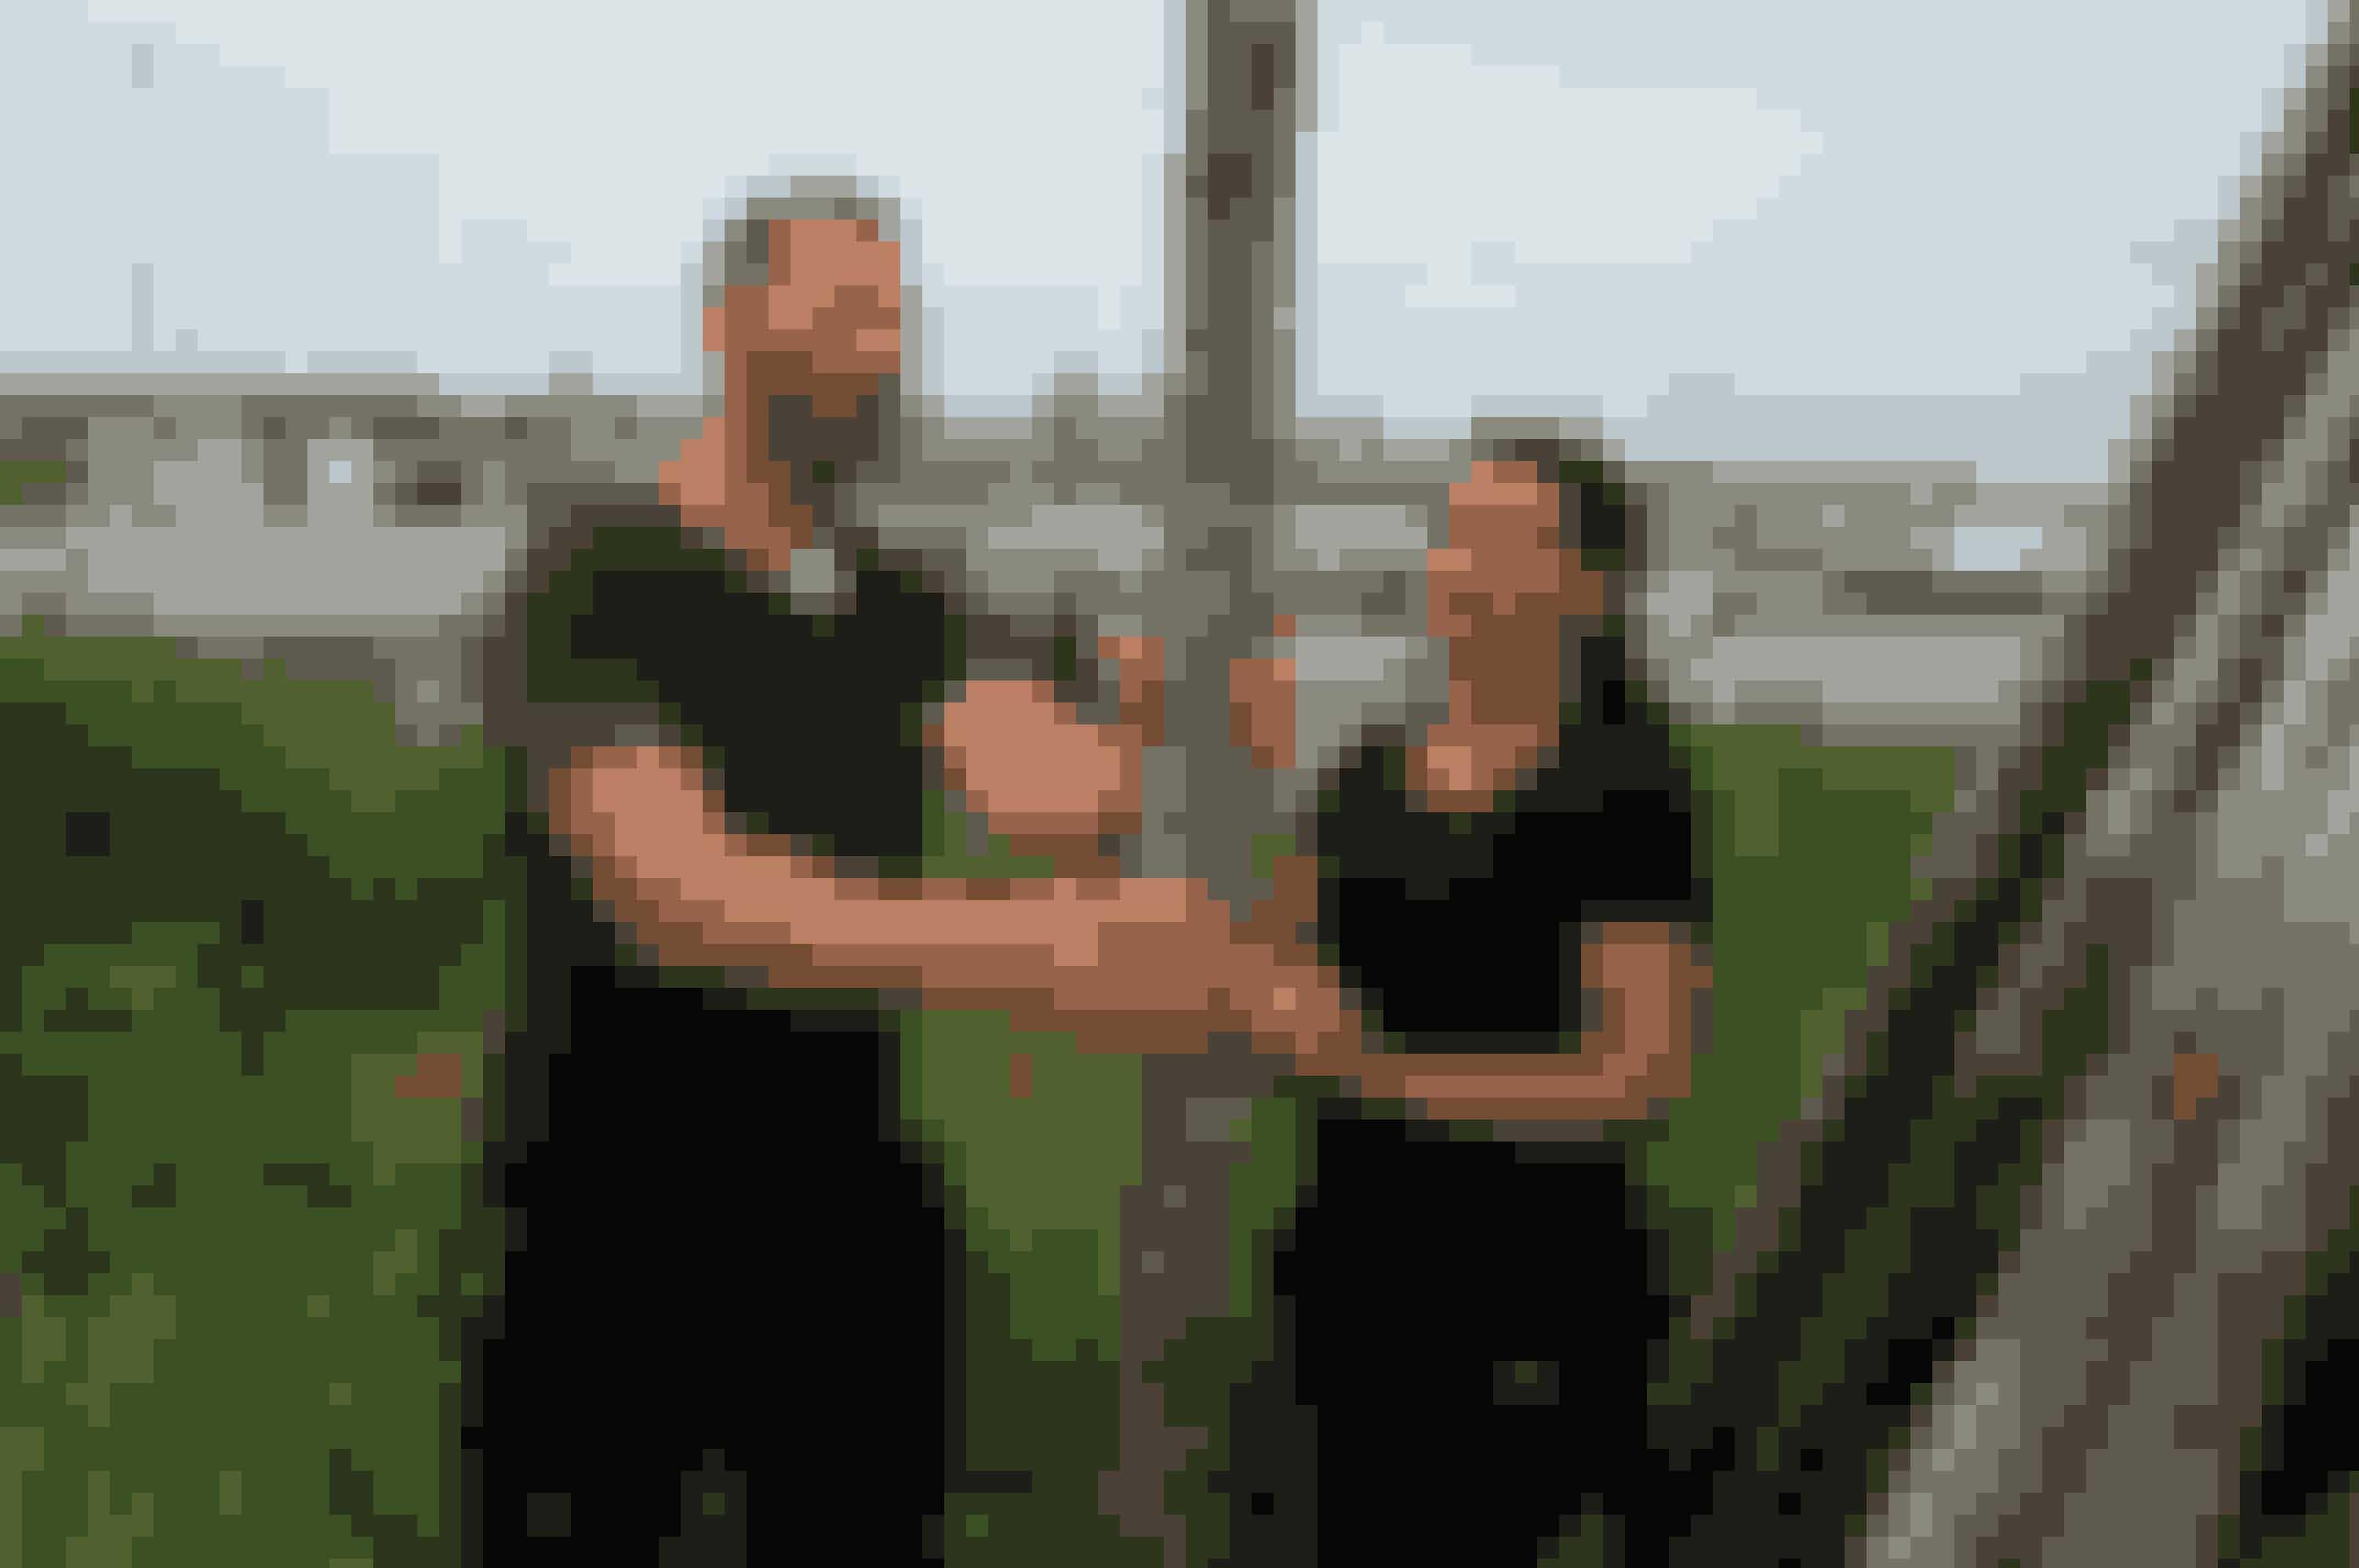 Charles og Cassia er gift og kommer fra Frederikshavn. (Jørn Deleuran/TV 2)